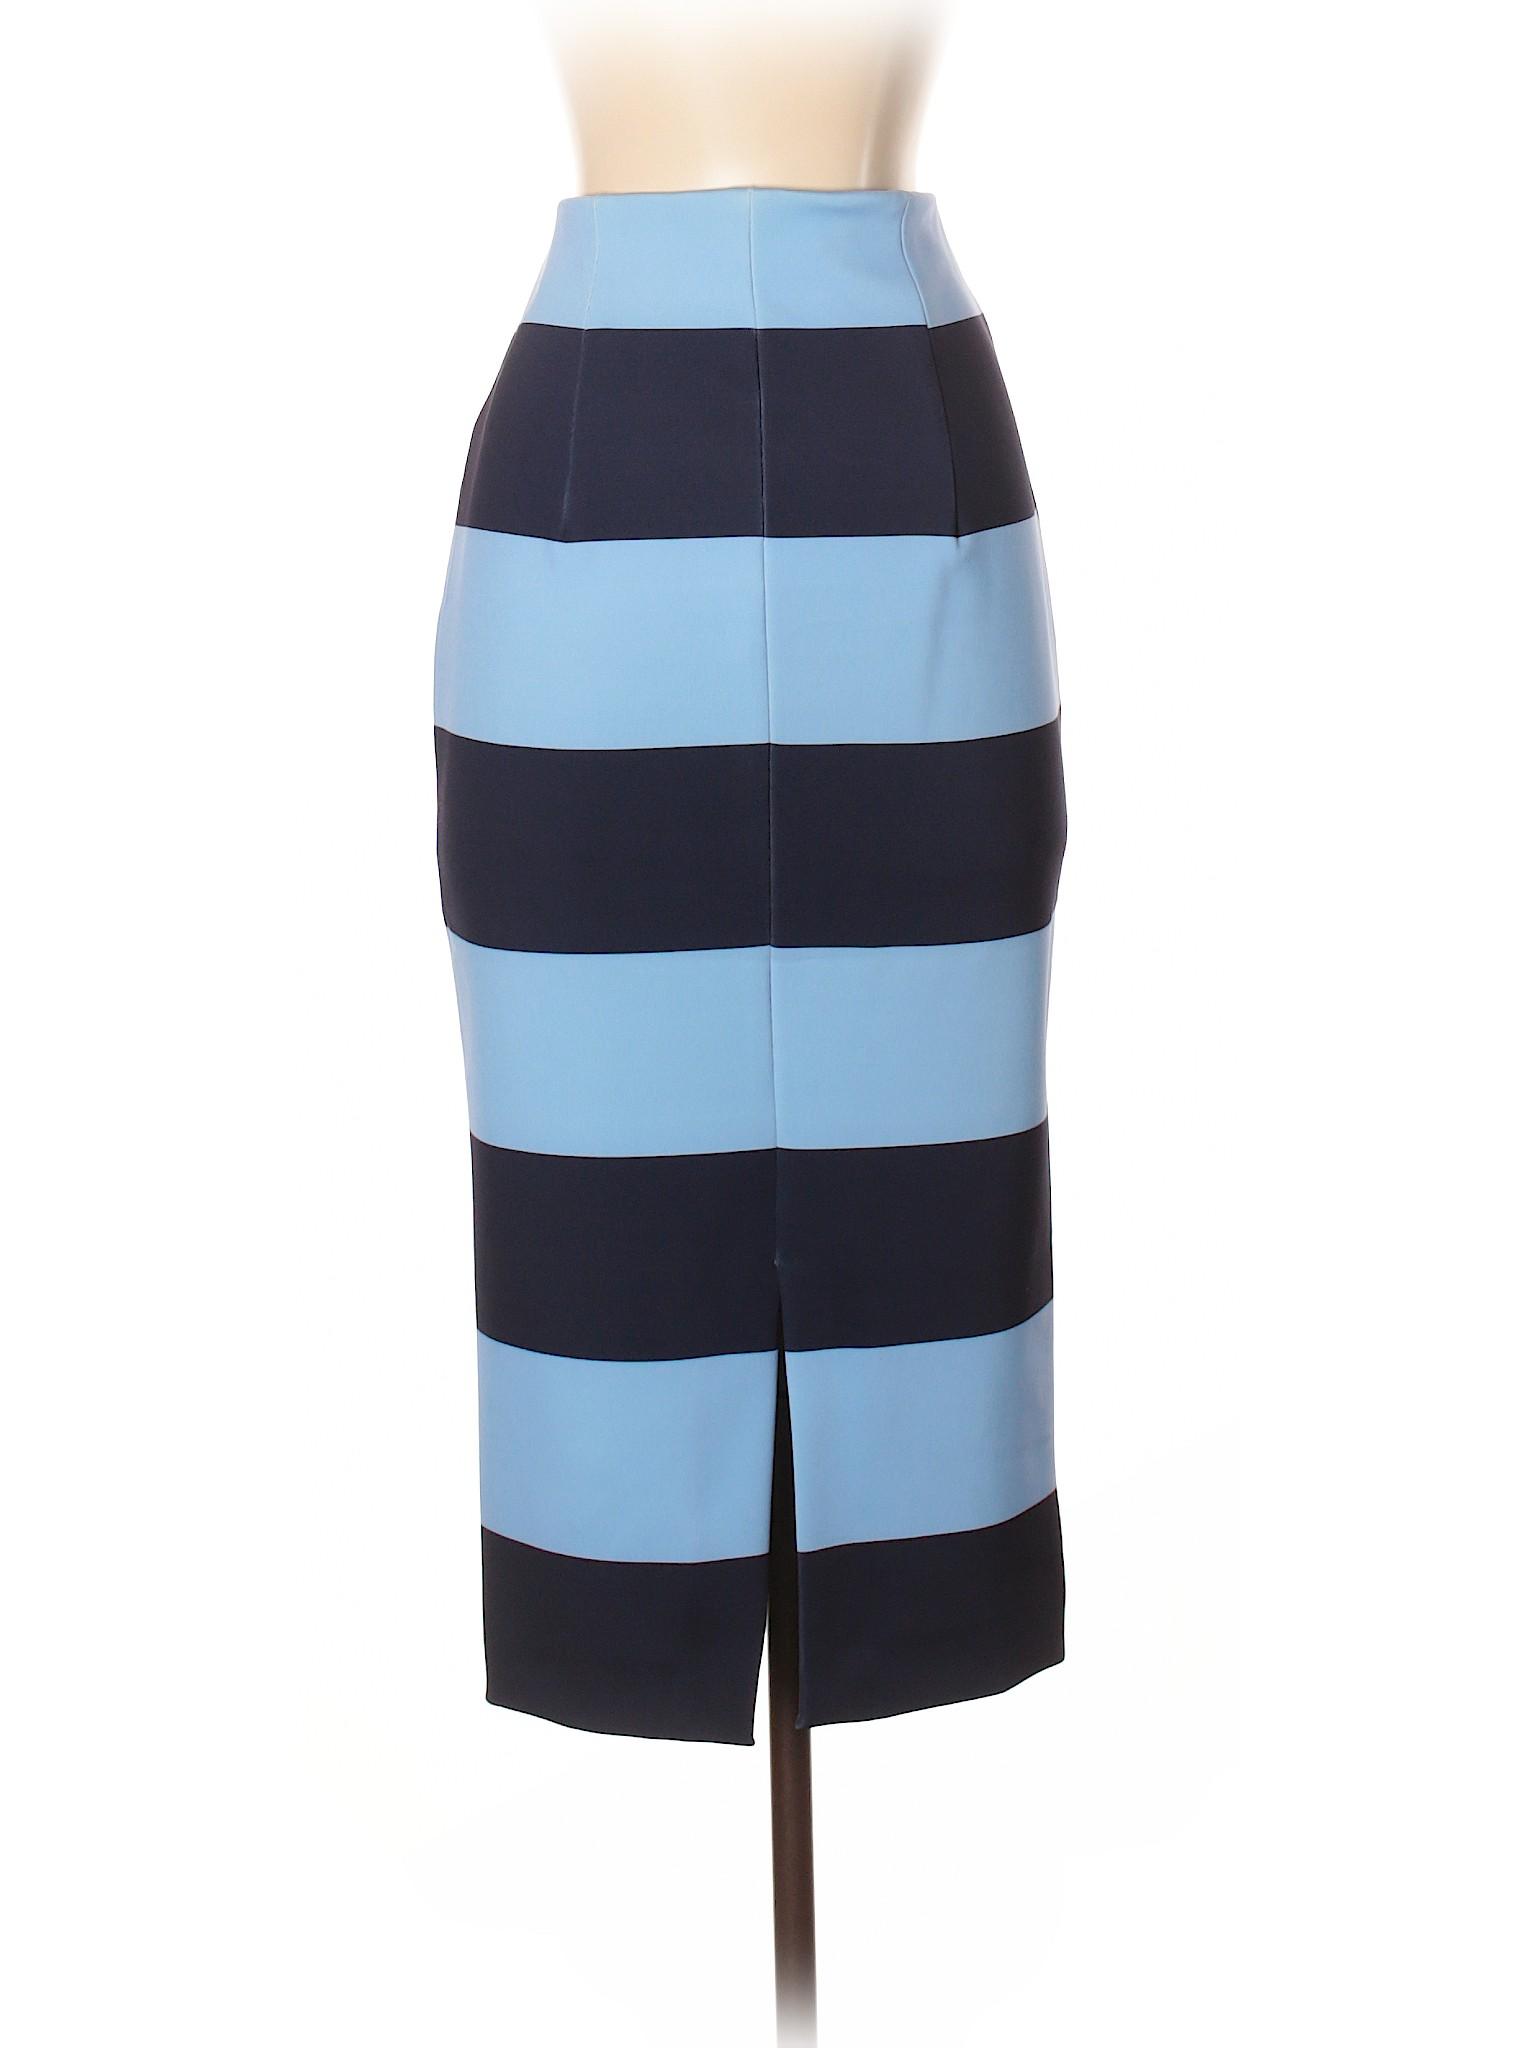 Skirt Boutique Skirt Boutique Casual Casual Skirt Casual Boutique Casual Boutique Skirt Boutique Skirt Casual 1xCqR4wO